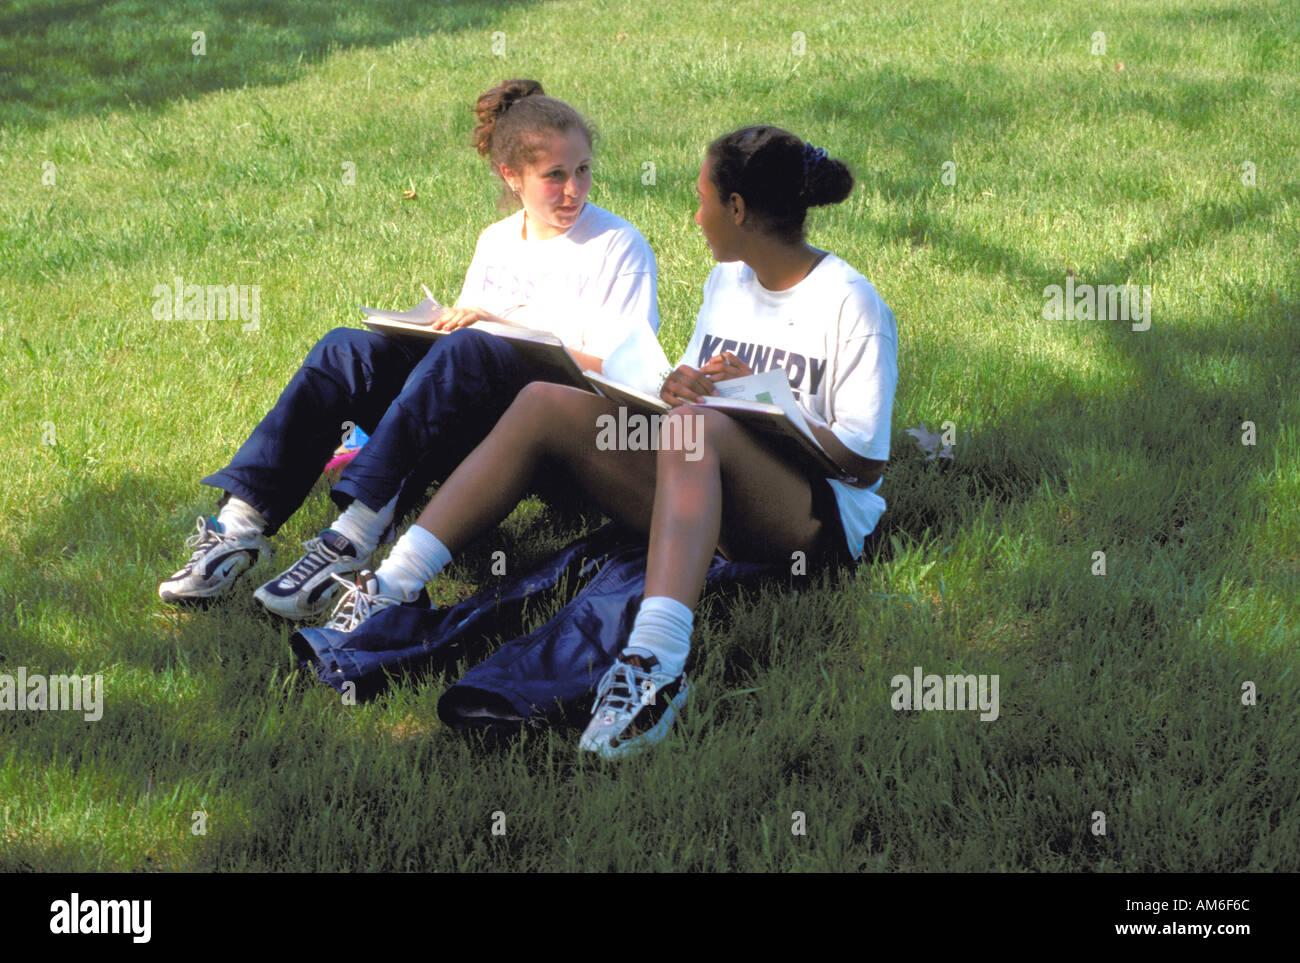 Friends age 14 studying together on grass. Minnetonka Minnesota USA Stock Photo